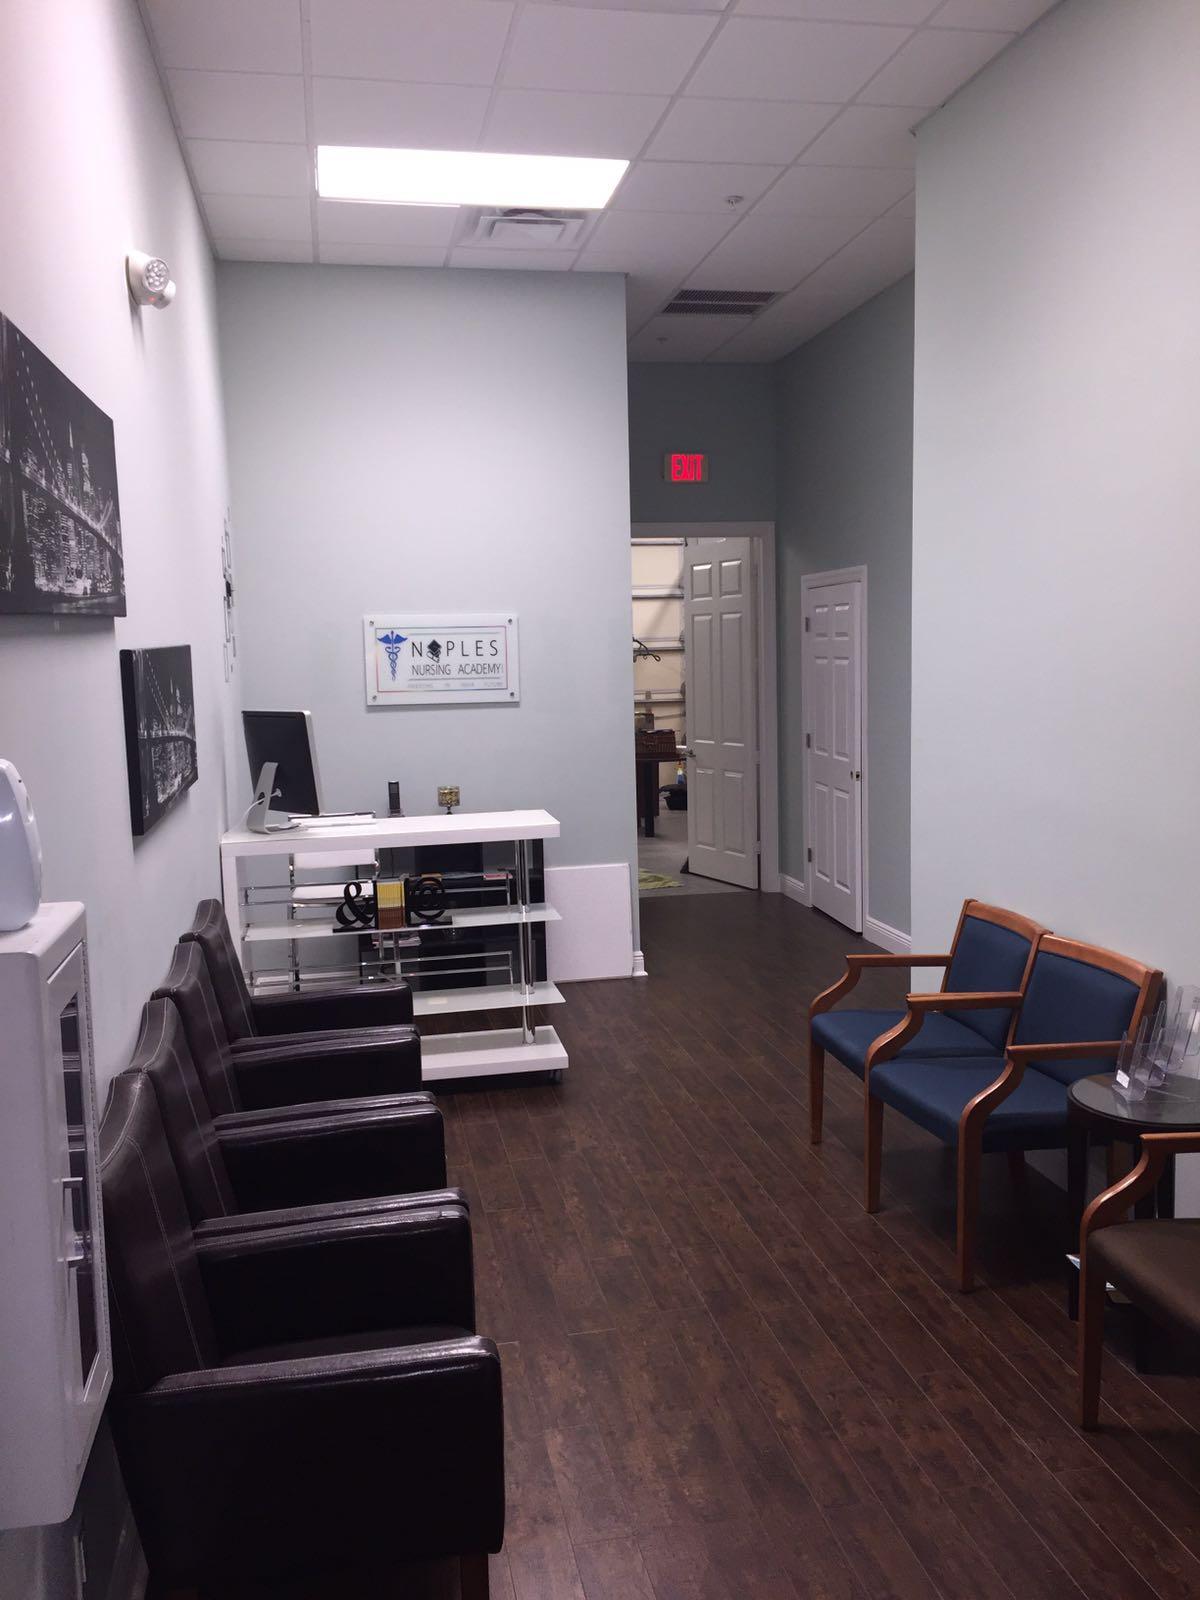 Naples Nursing - Sitting Area